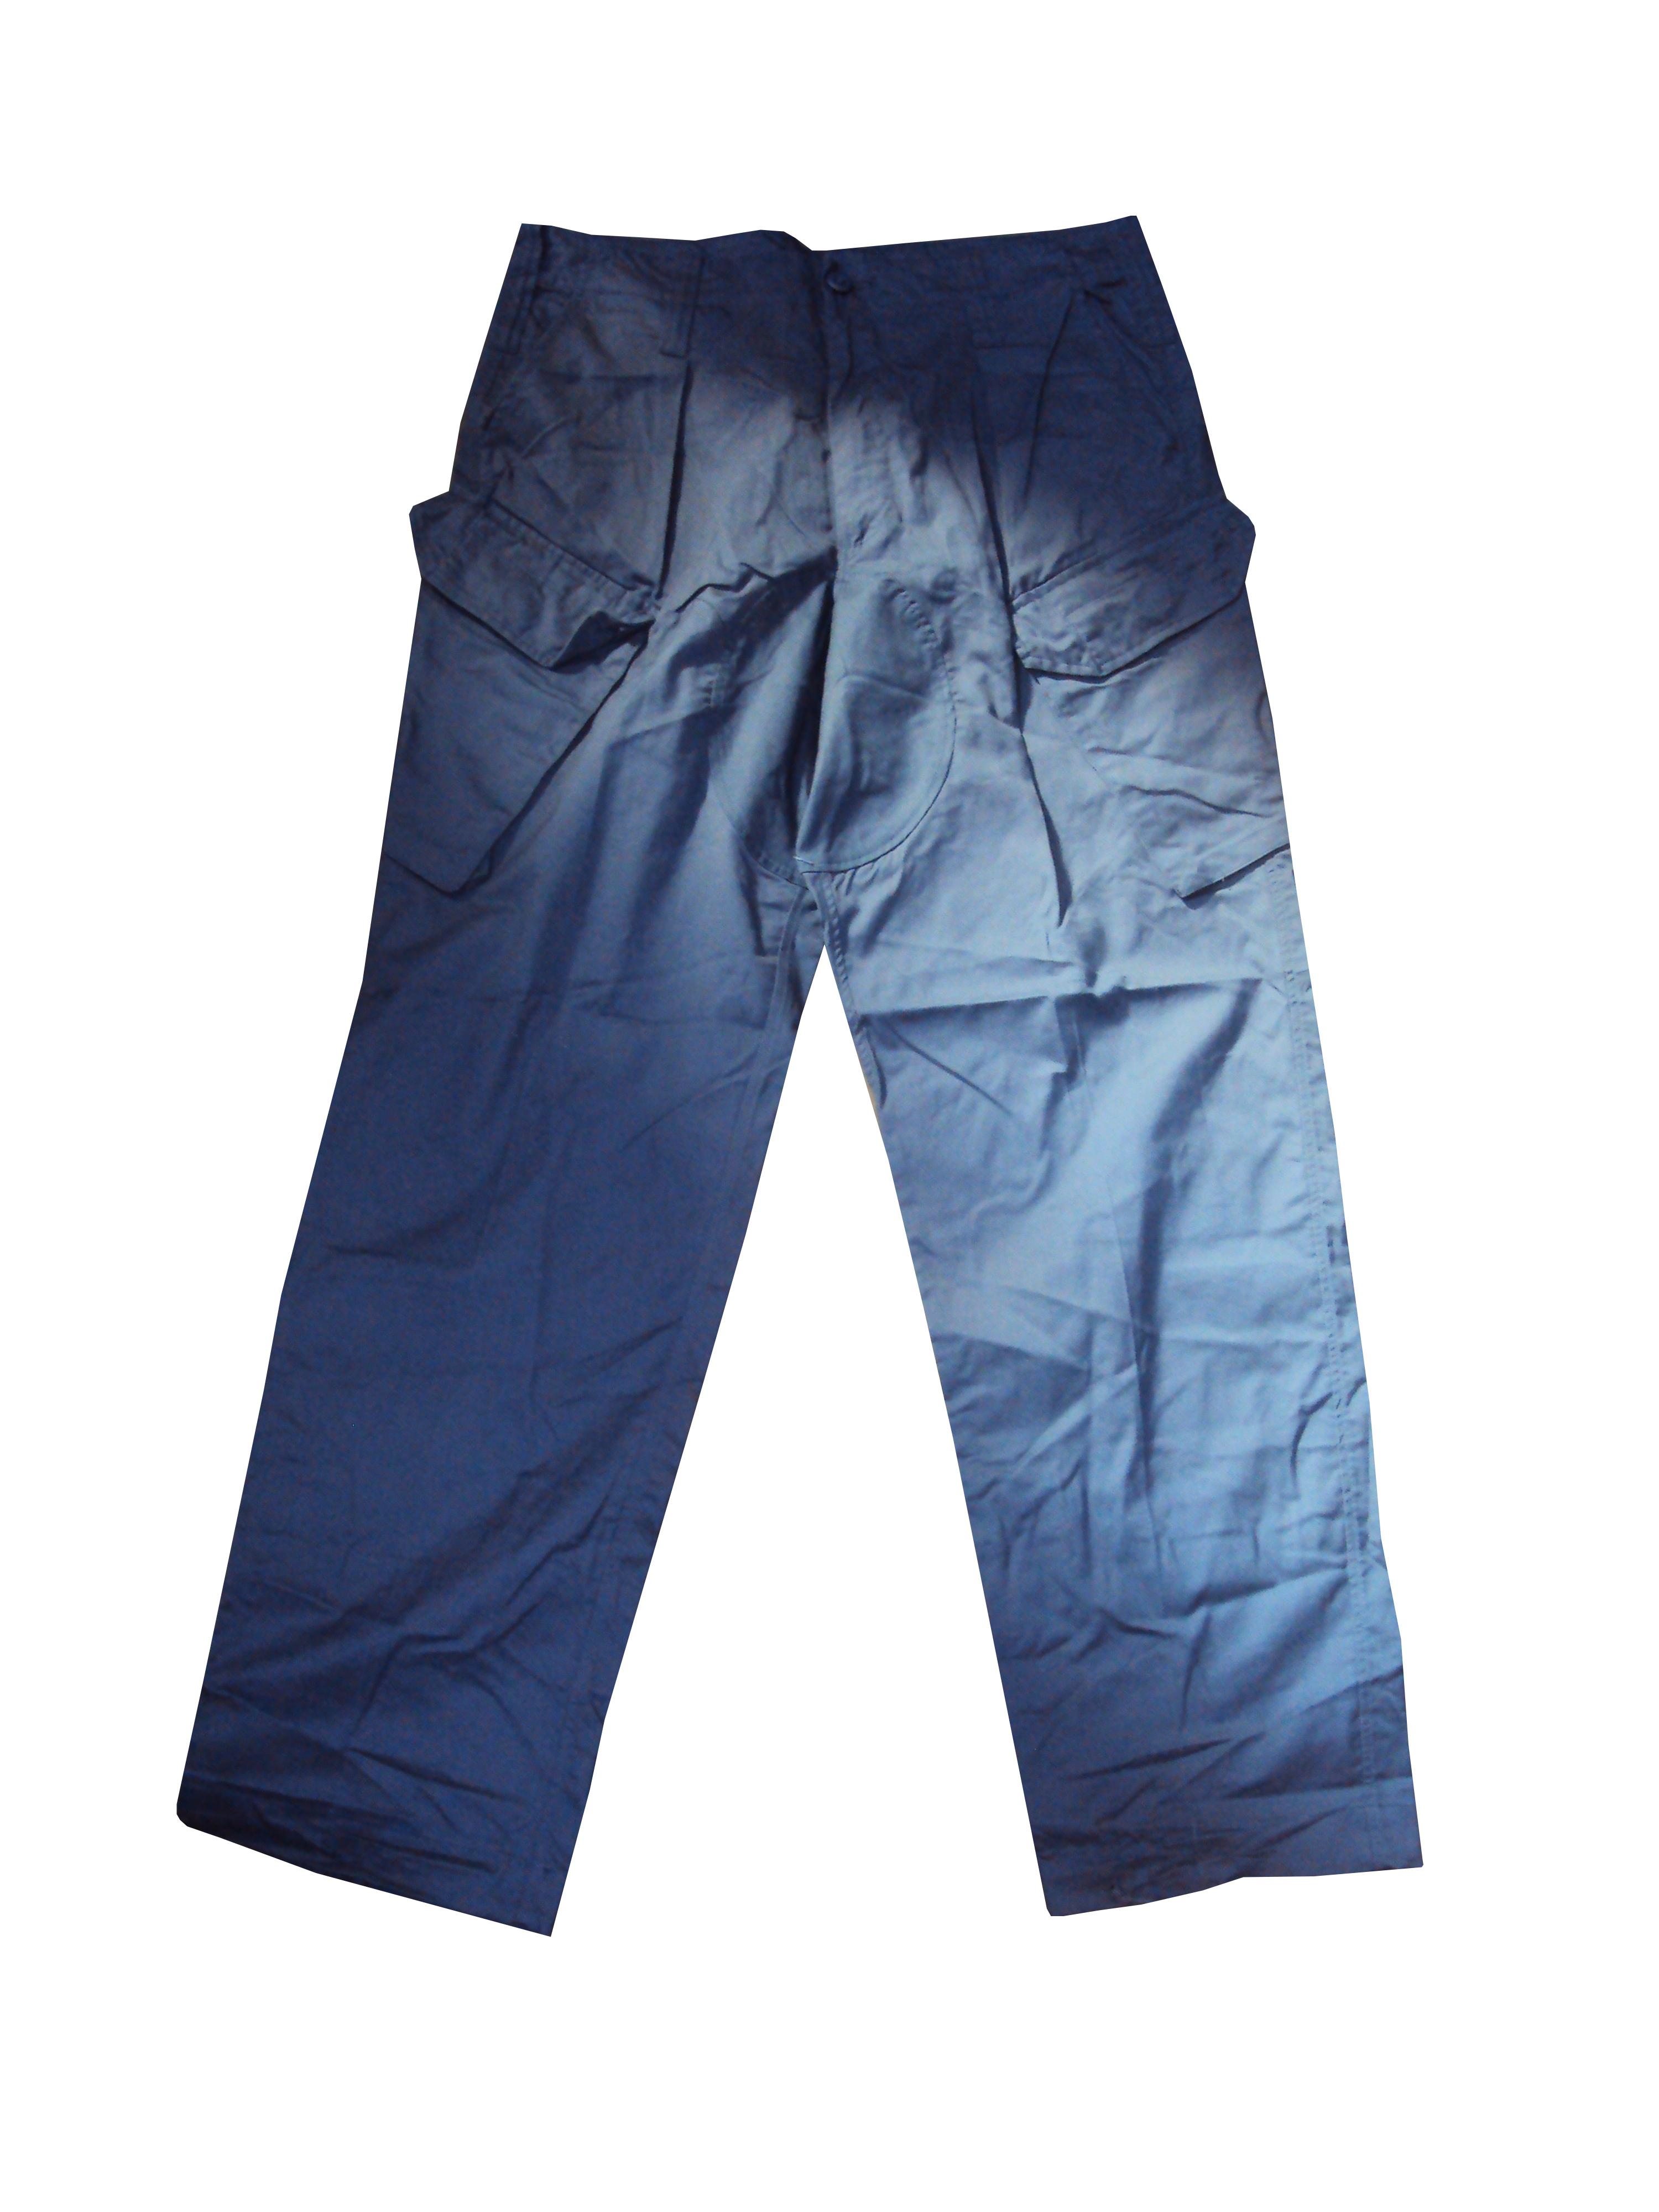 Lot 3 - Pack of 10 - Royal Navy/ RAF PCS Trousers - Grade 1